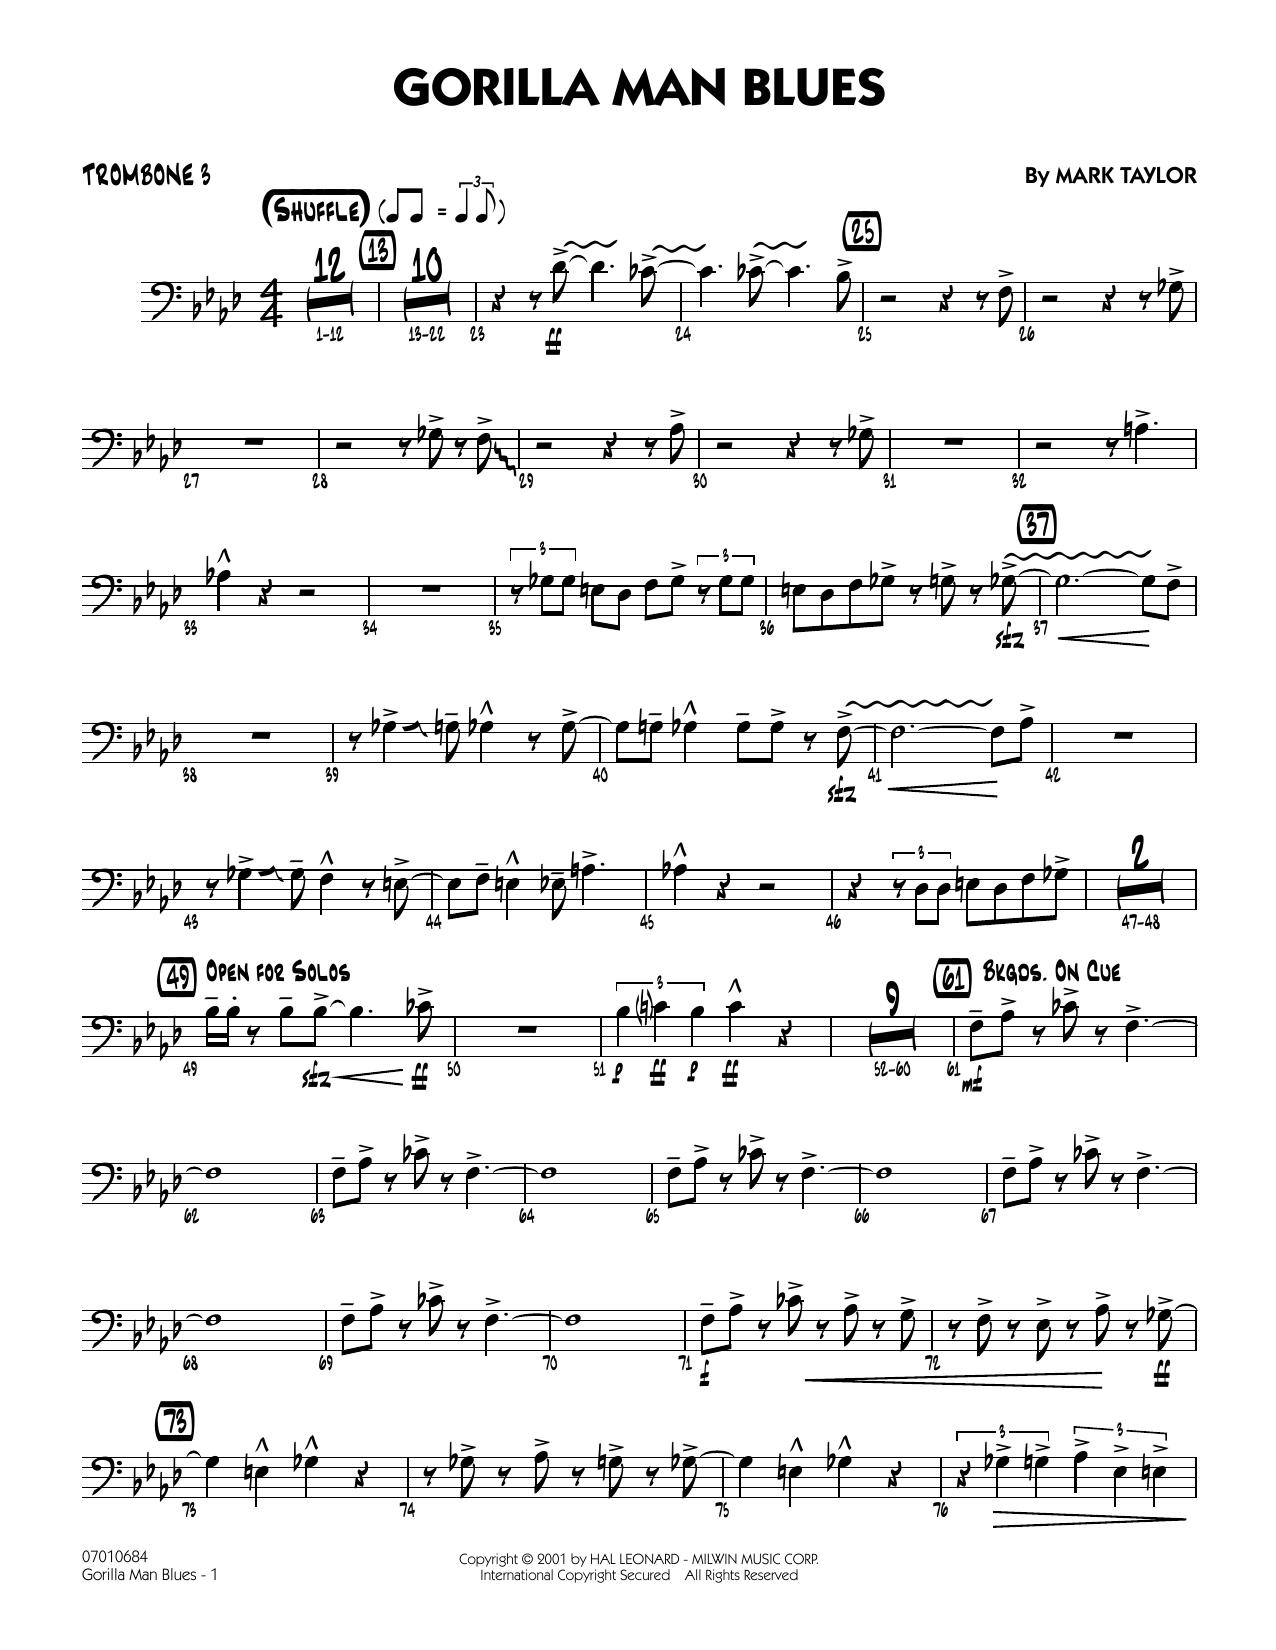 Gorilla Man Blues - Trombone 3 Sheet Music